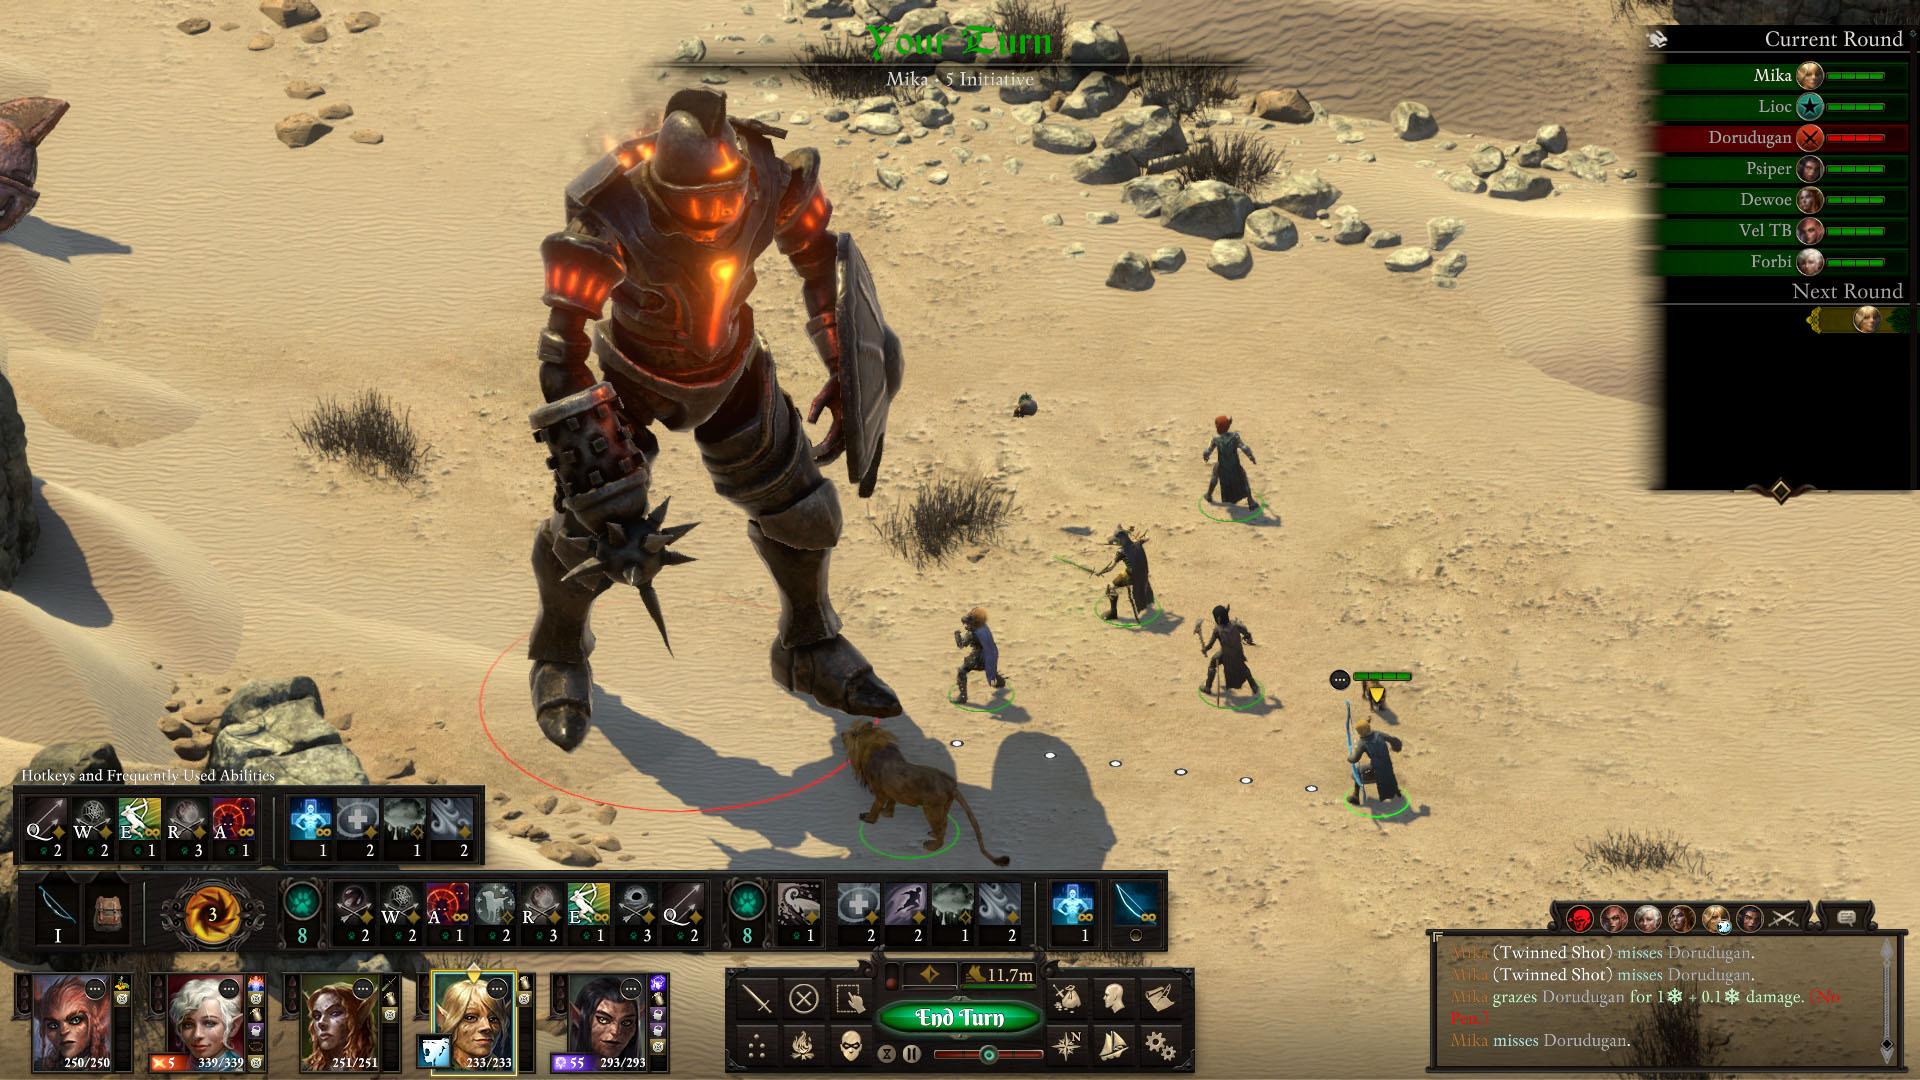 Pillars of Eternity II: Deadfire Companions Guide: locations